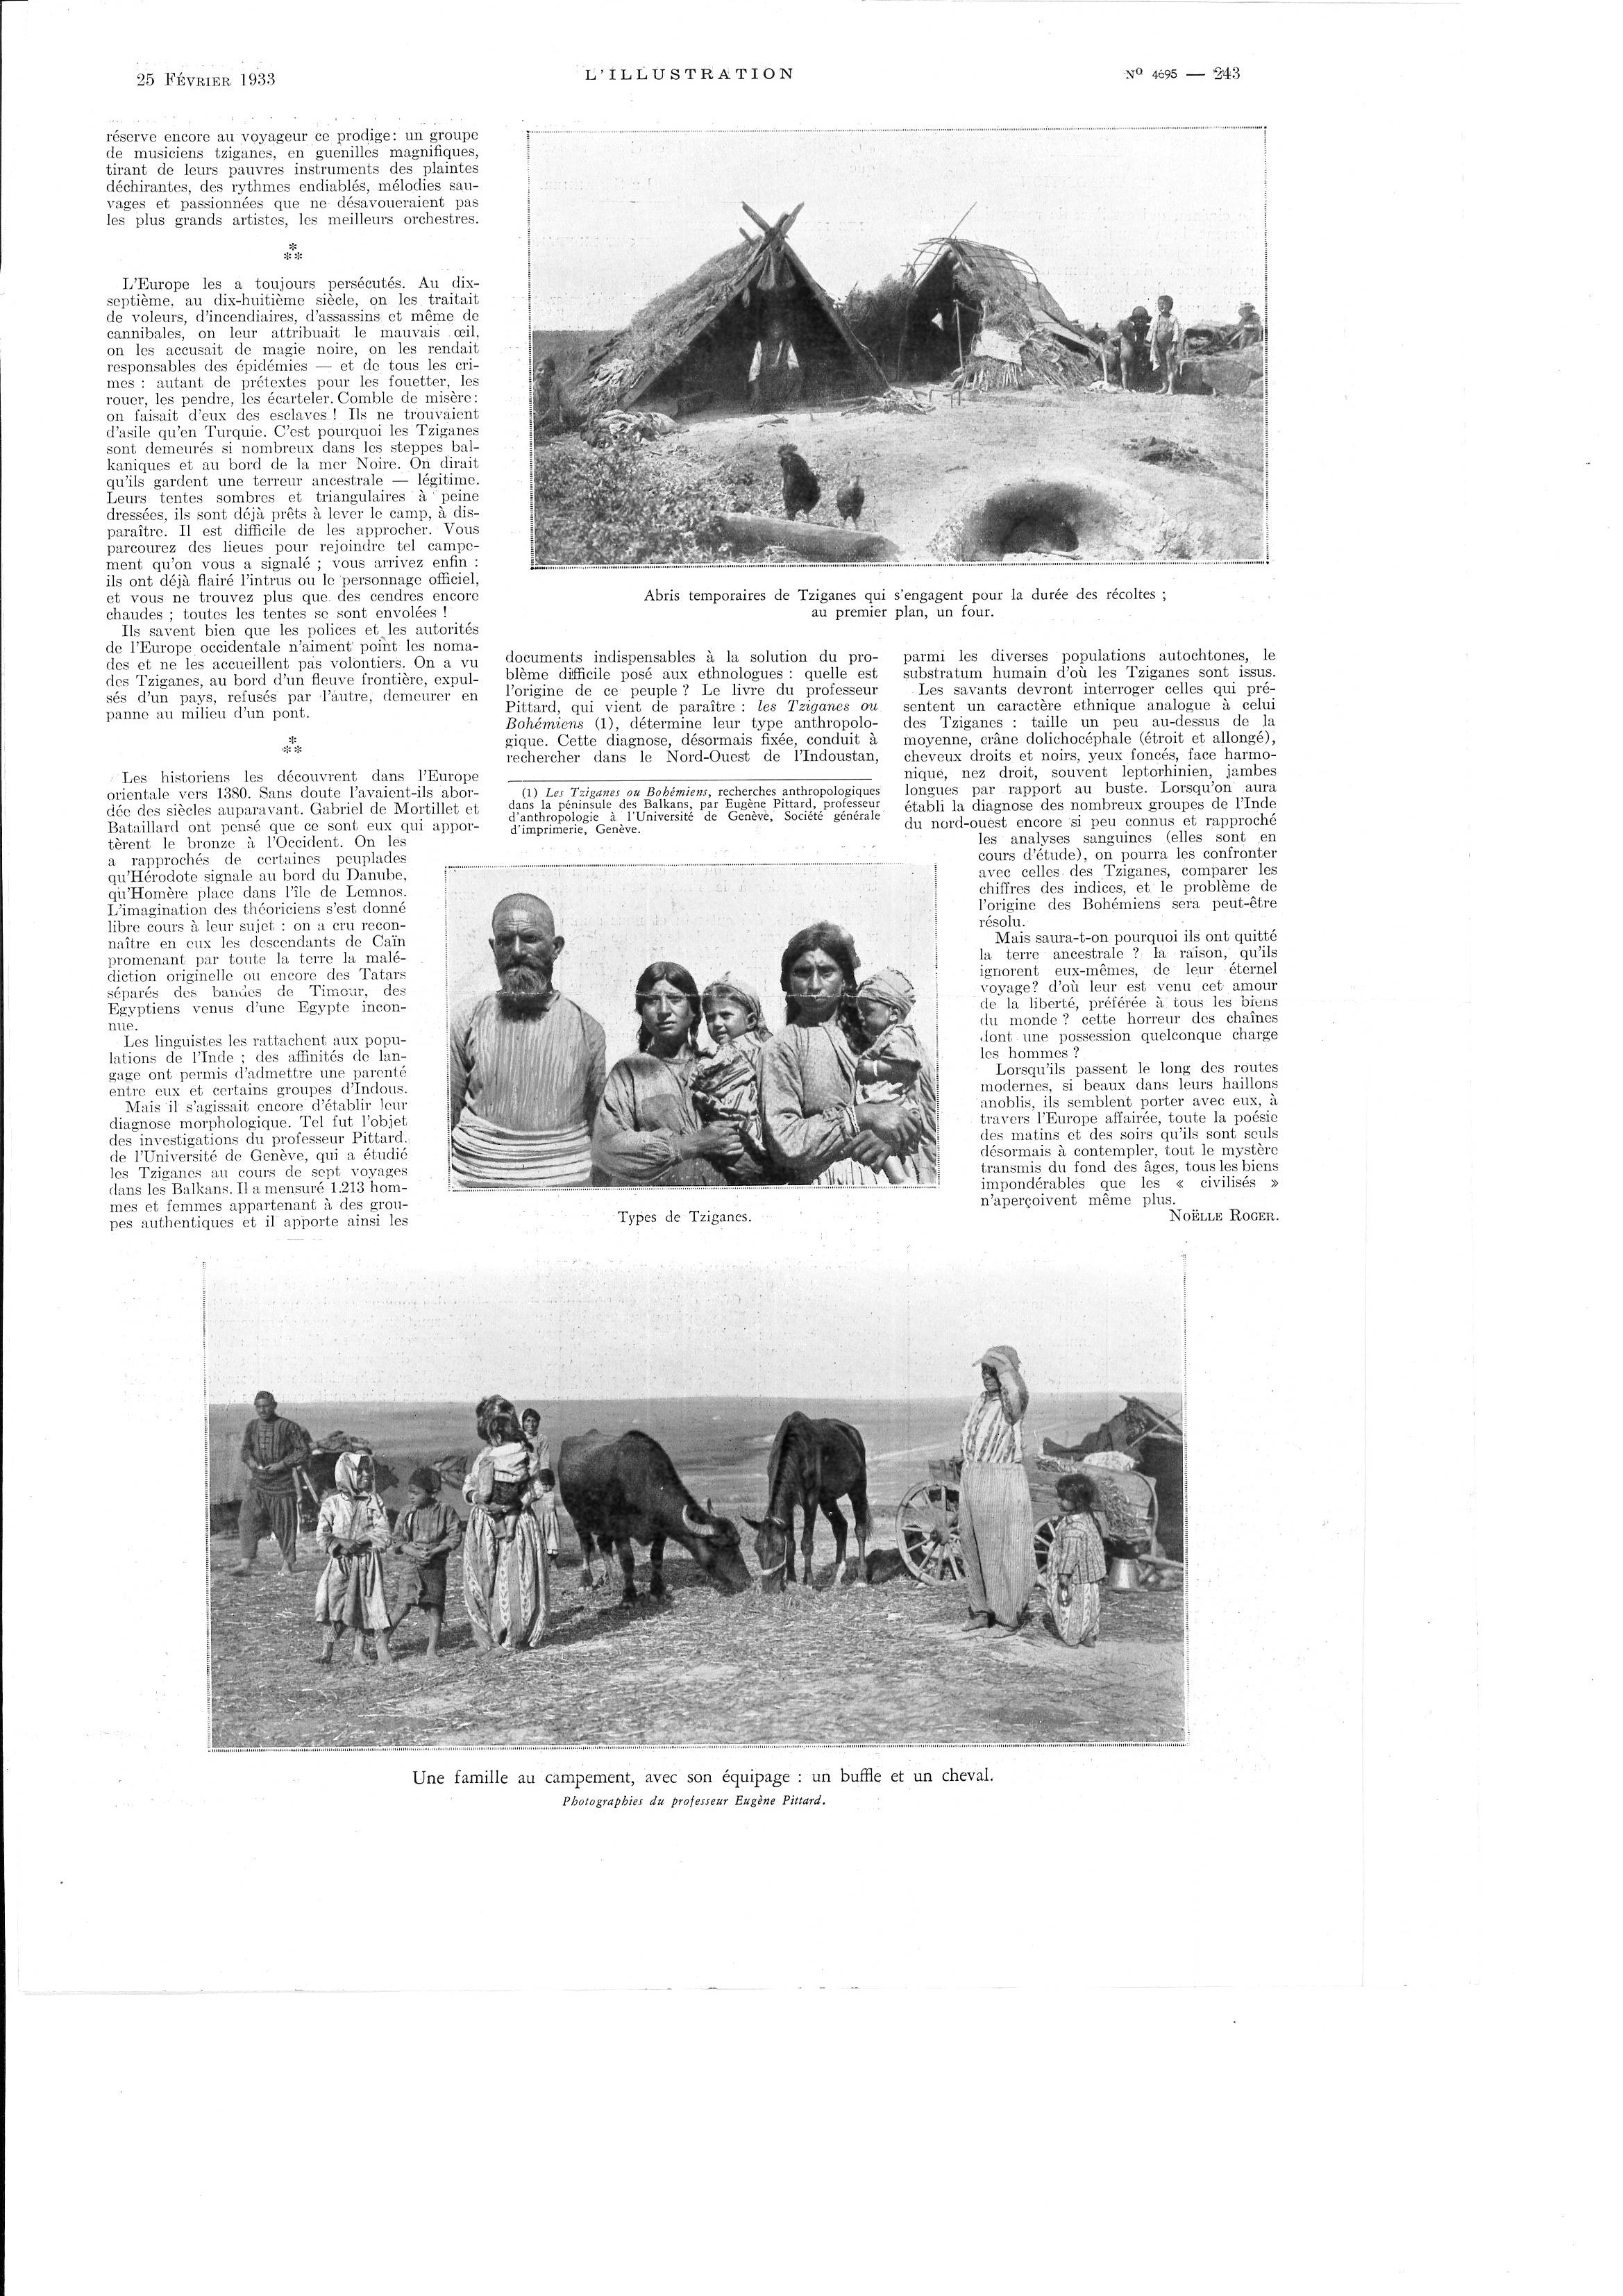 p.243.jpg - image/jpeg